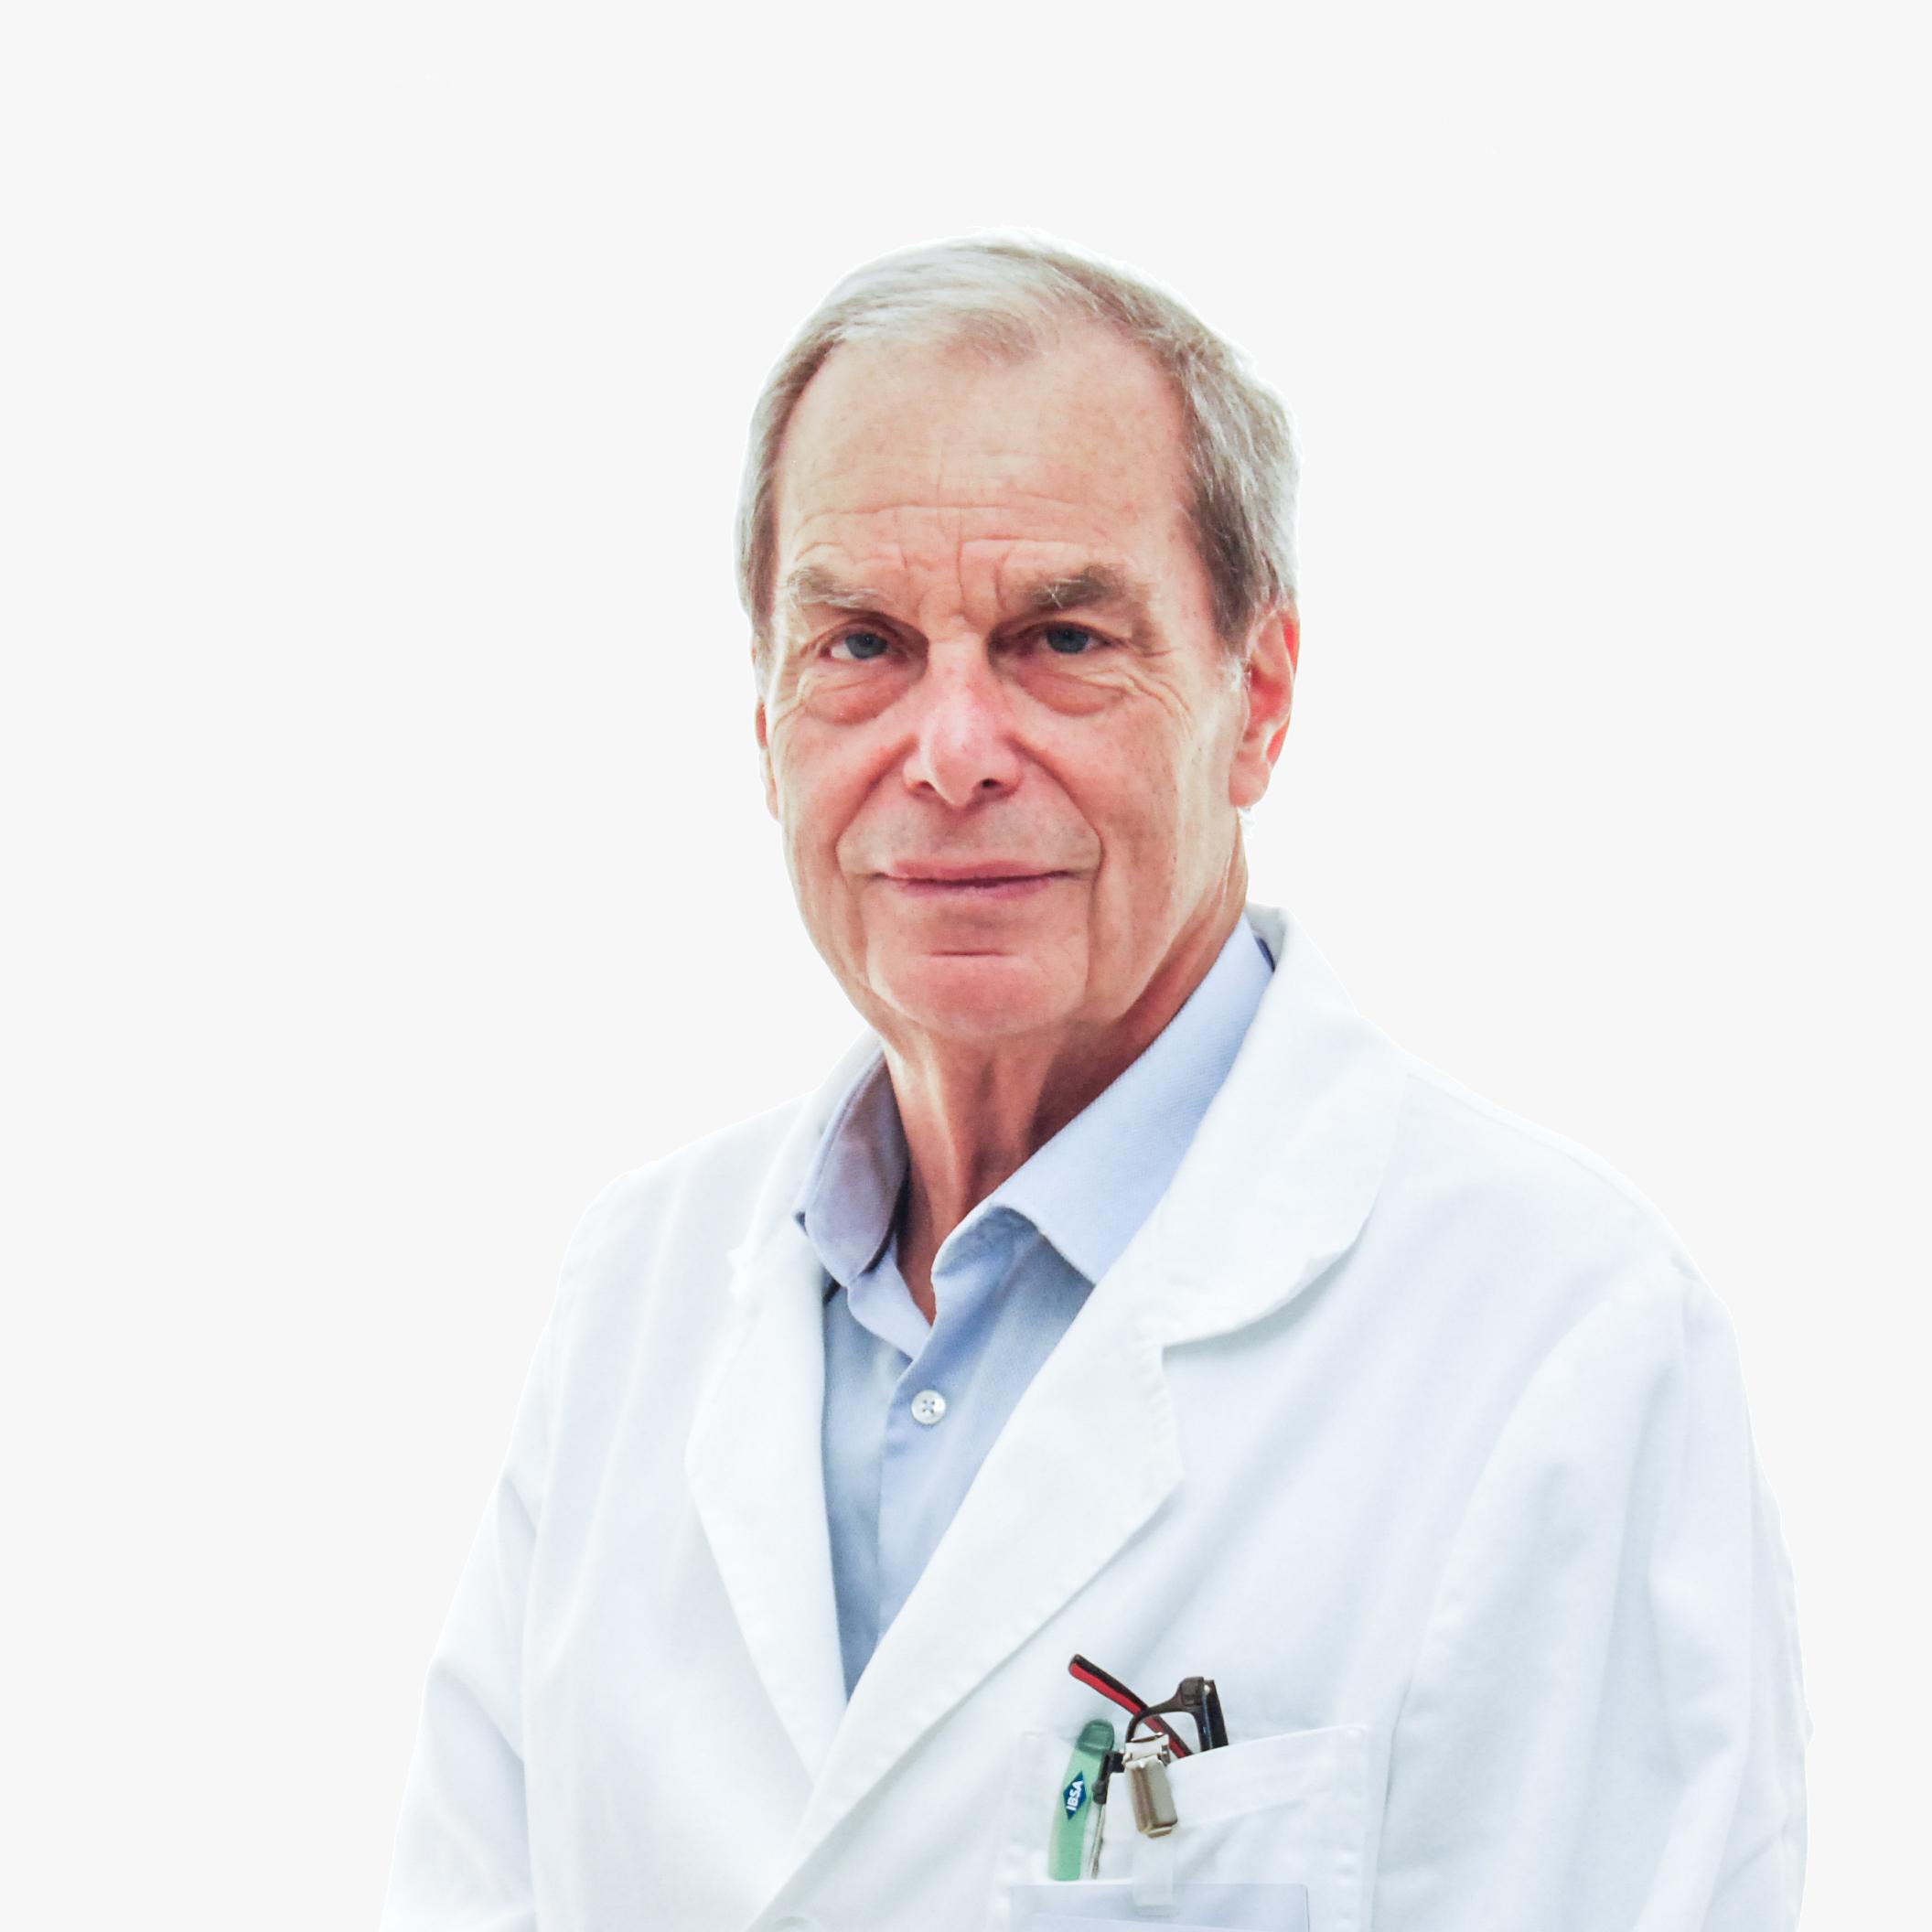 Dr.Ackermann